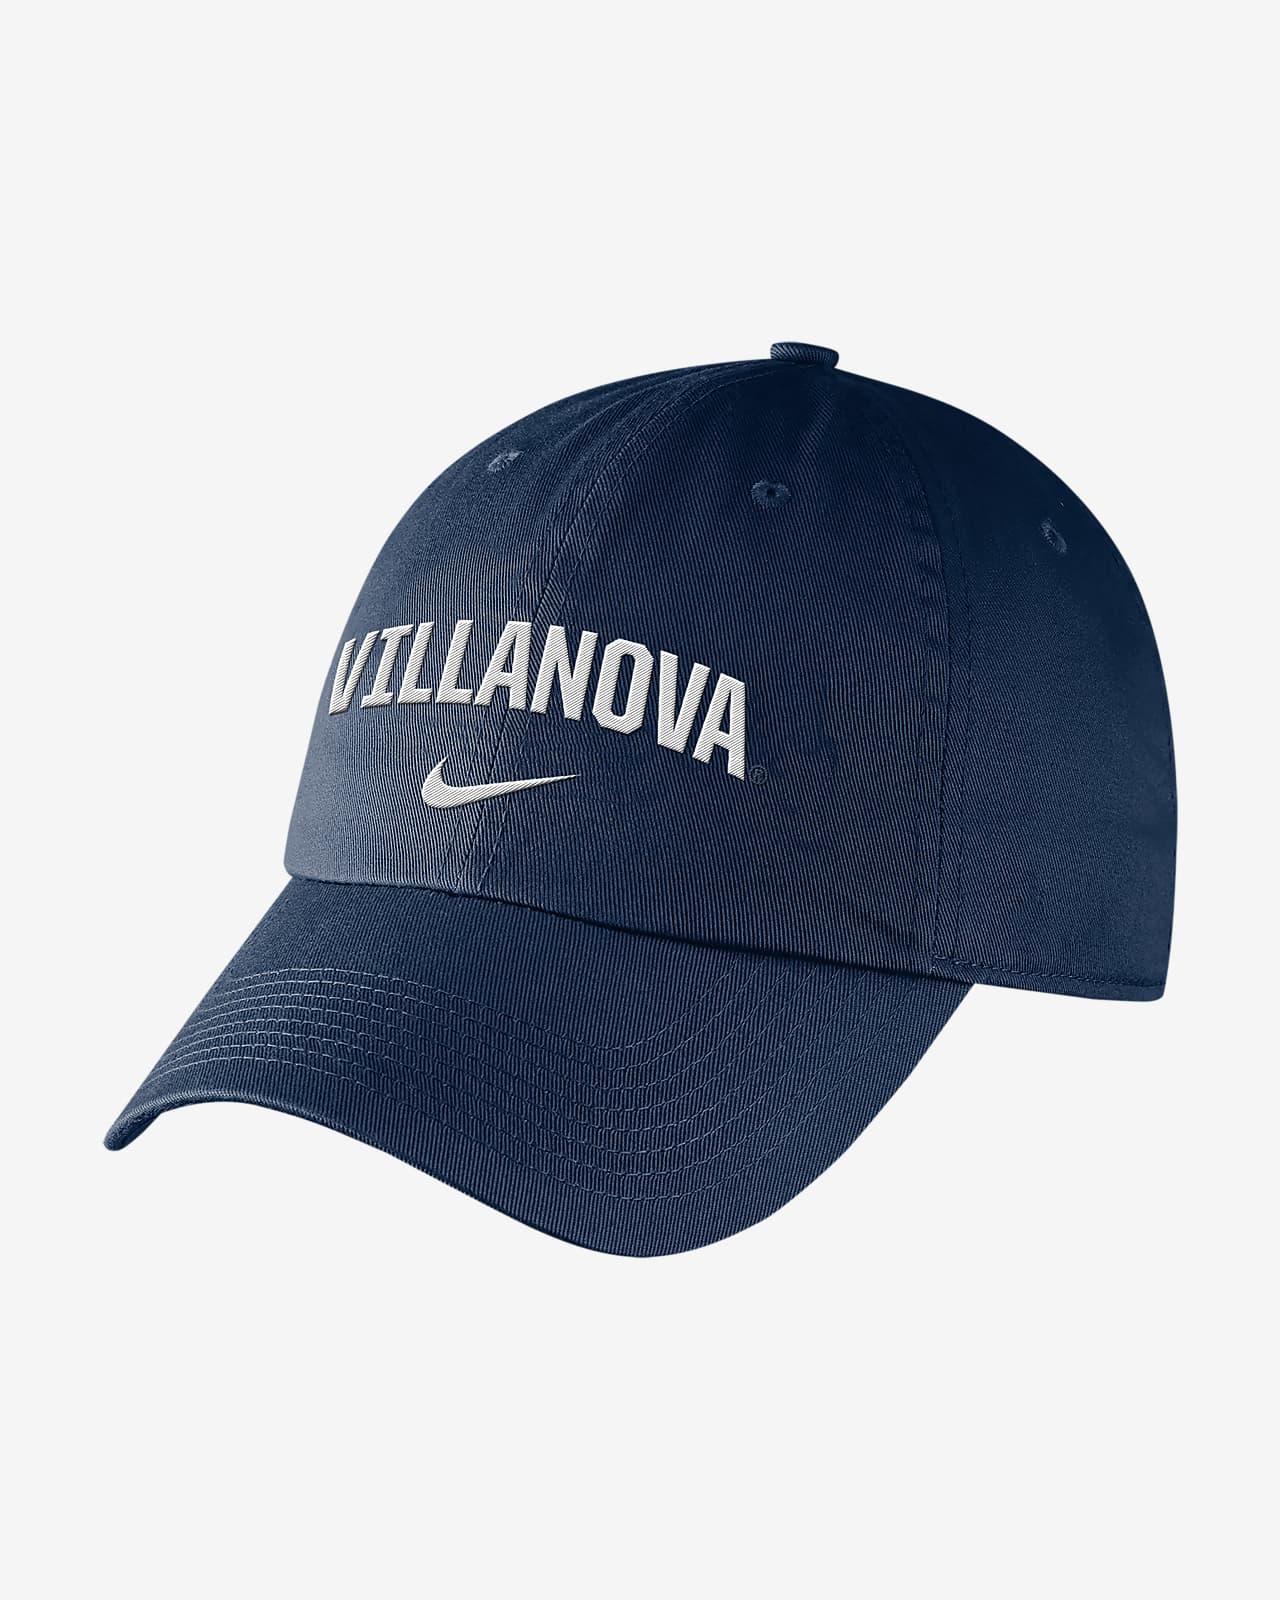 Nike College (Villanova) Hat